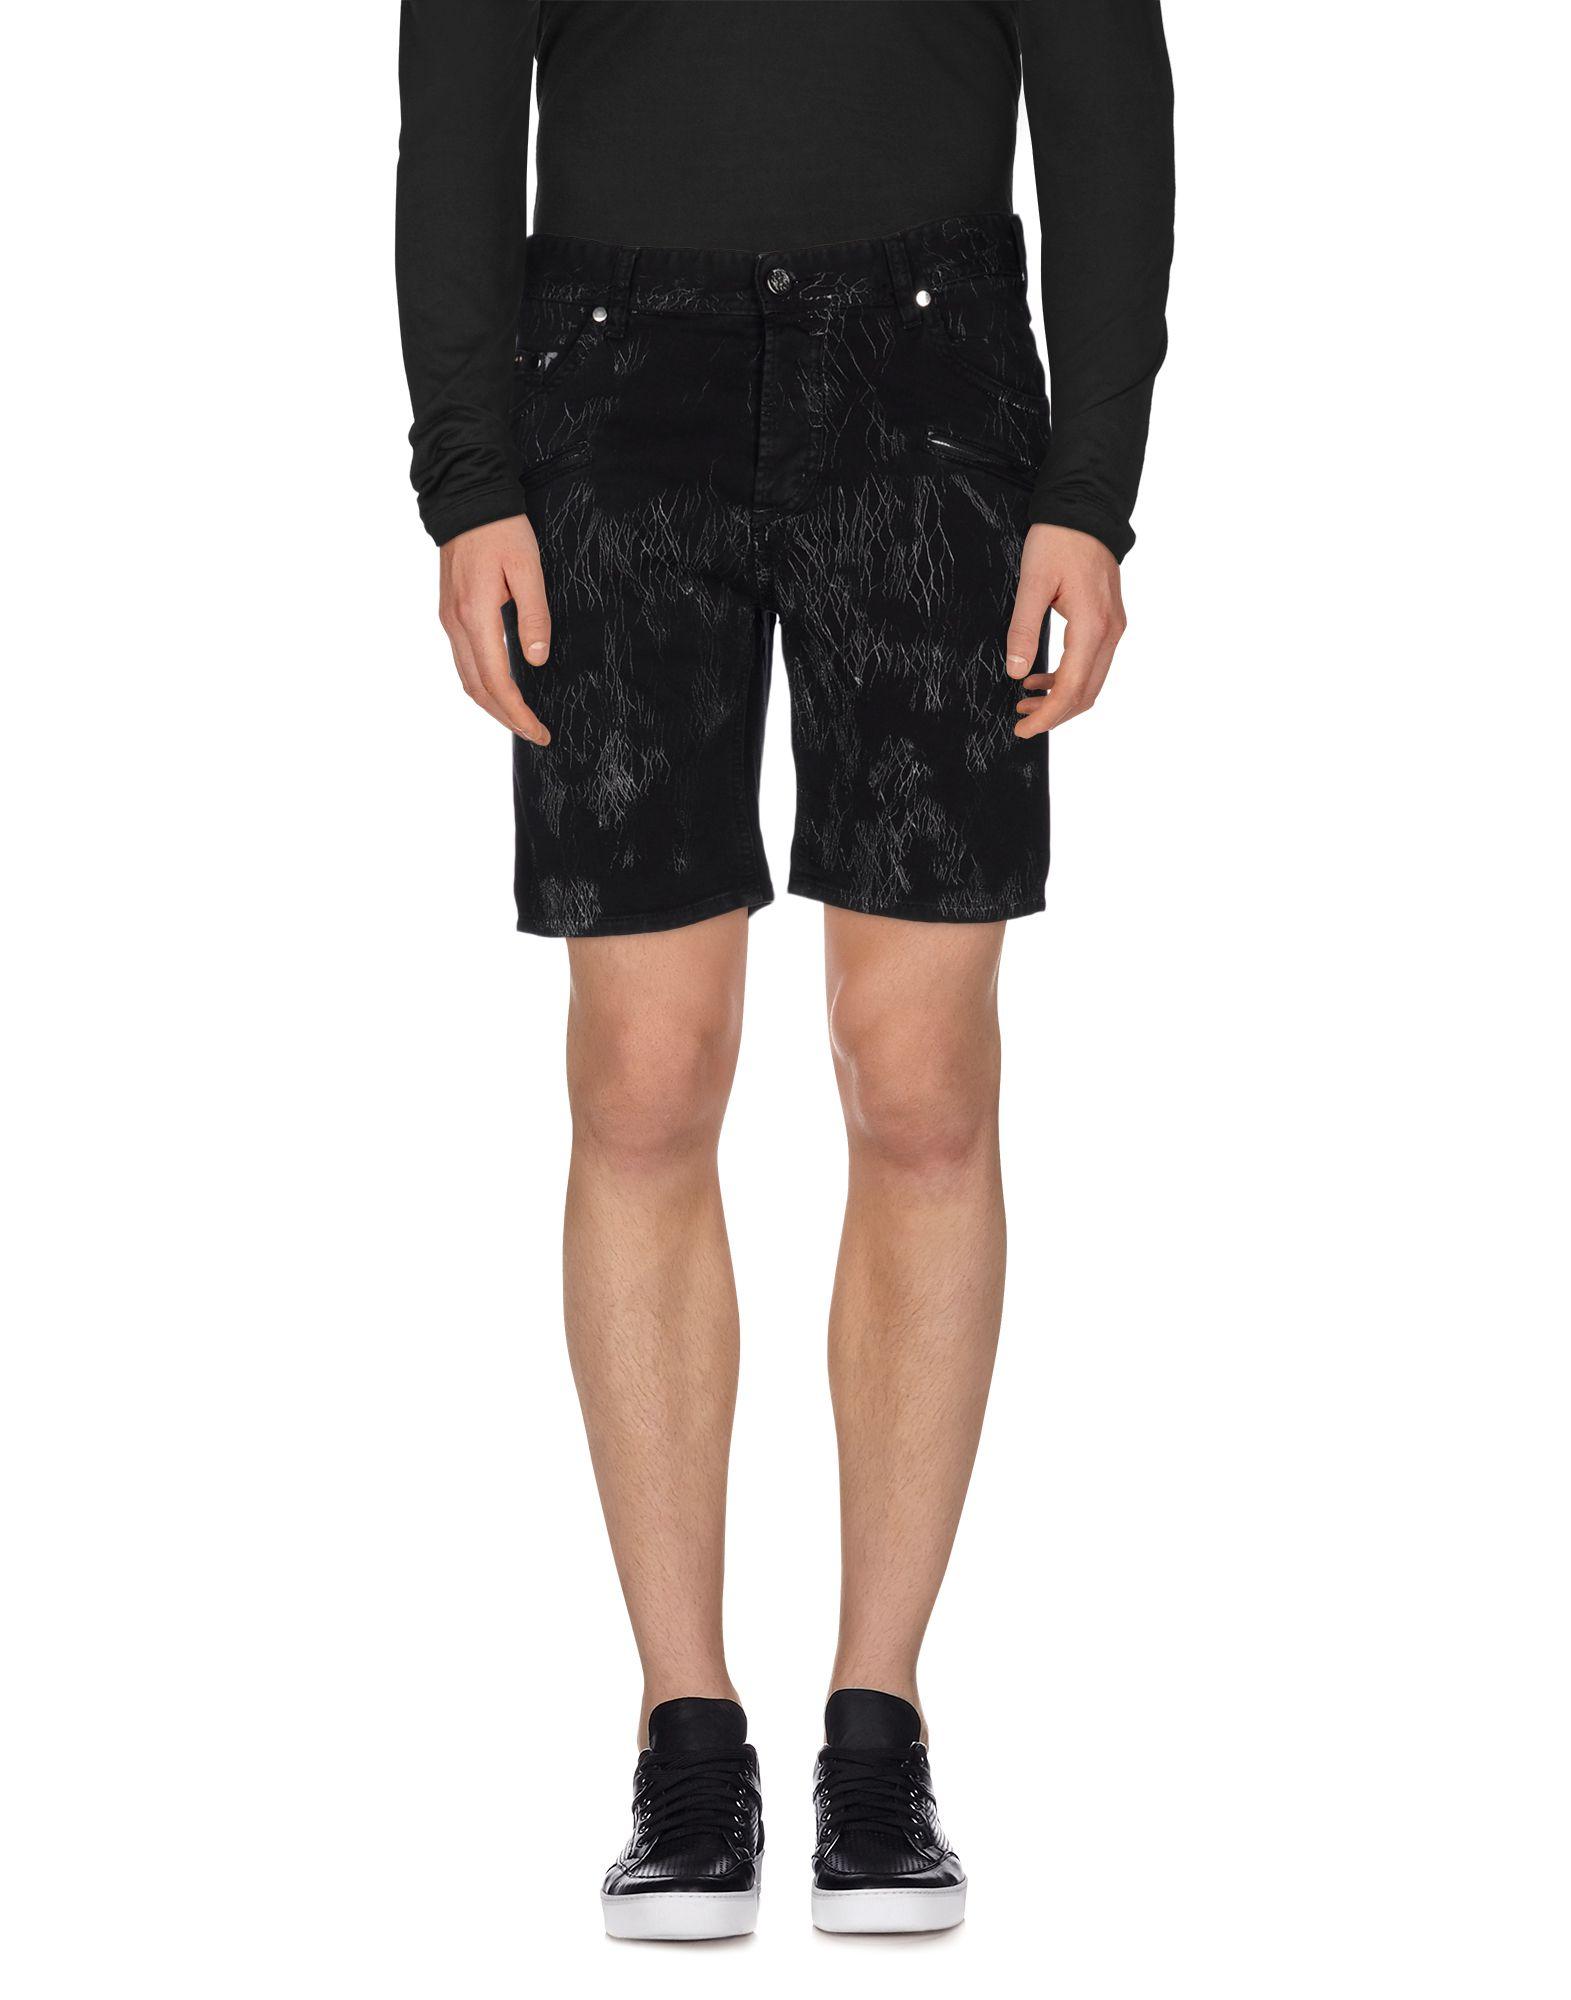 Shorts Jeans Just Cavalli Uomo - Acquista online su